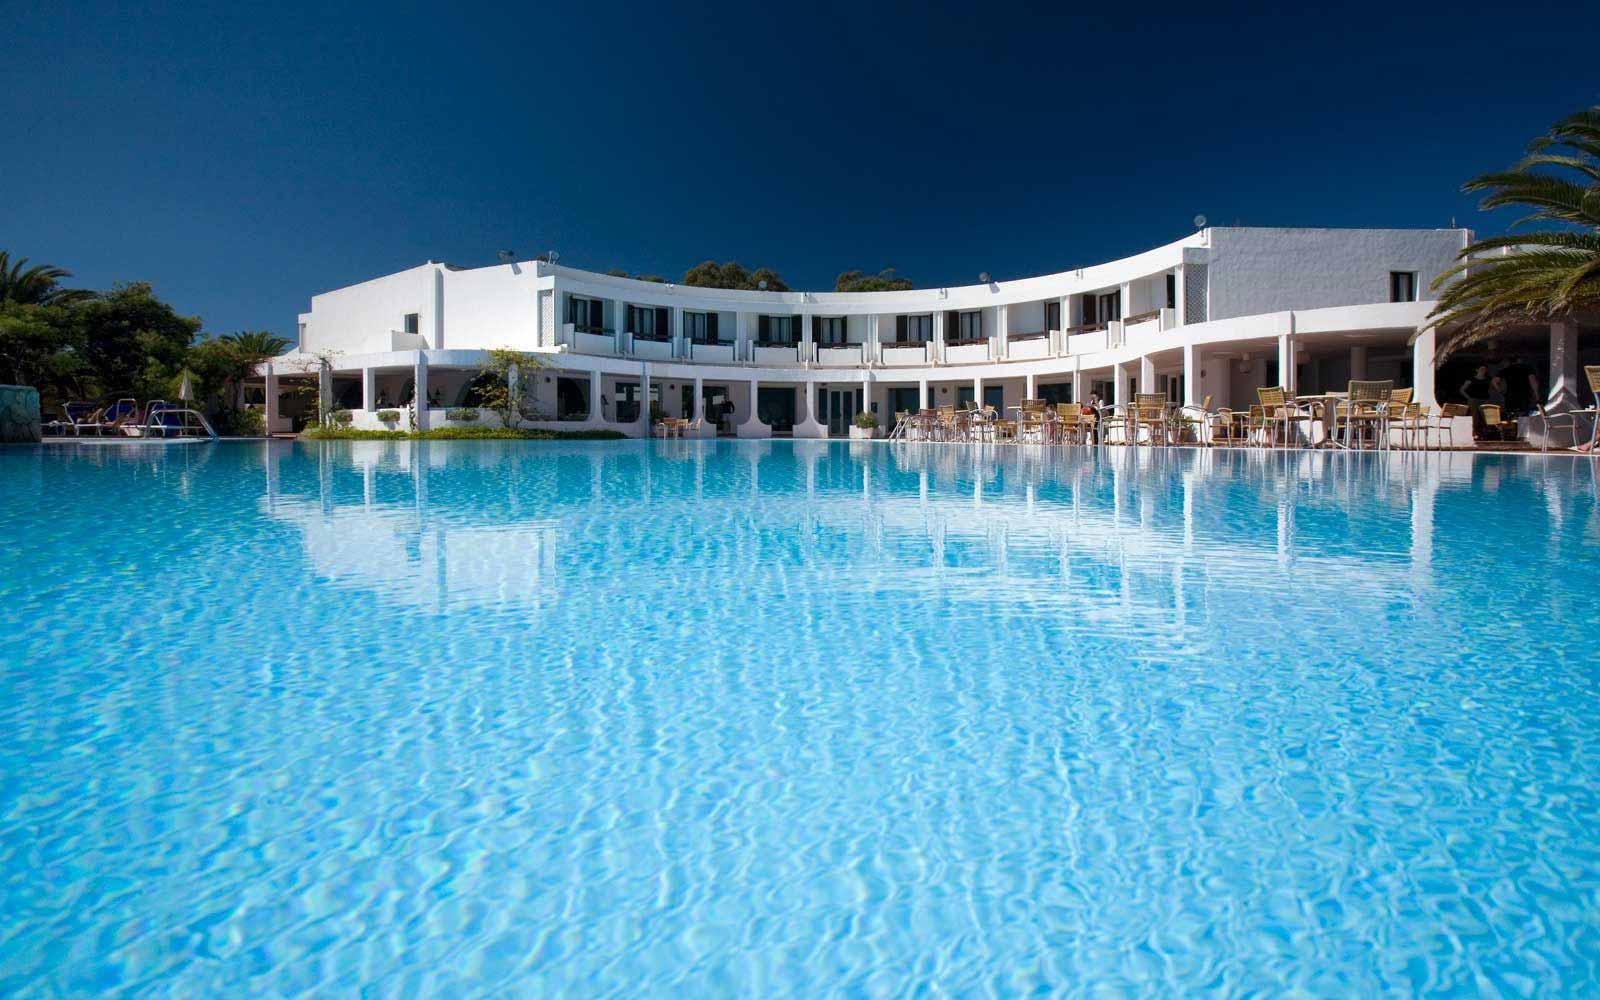 Hotel Flamingo Swimming pool